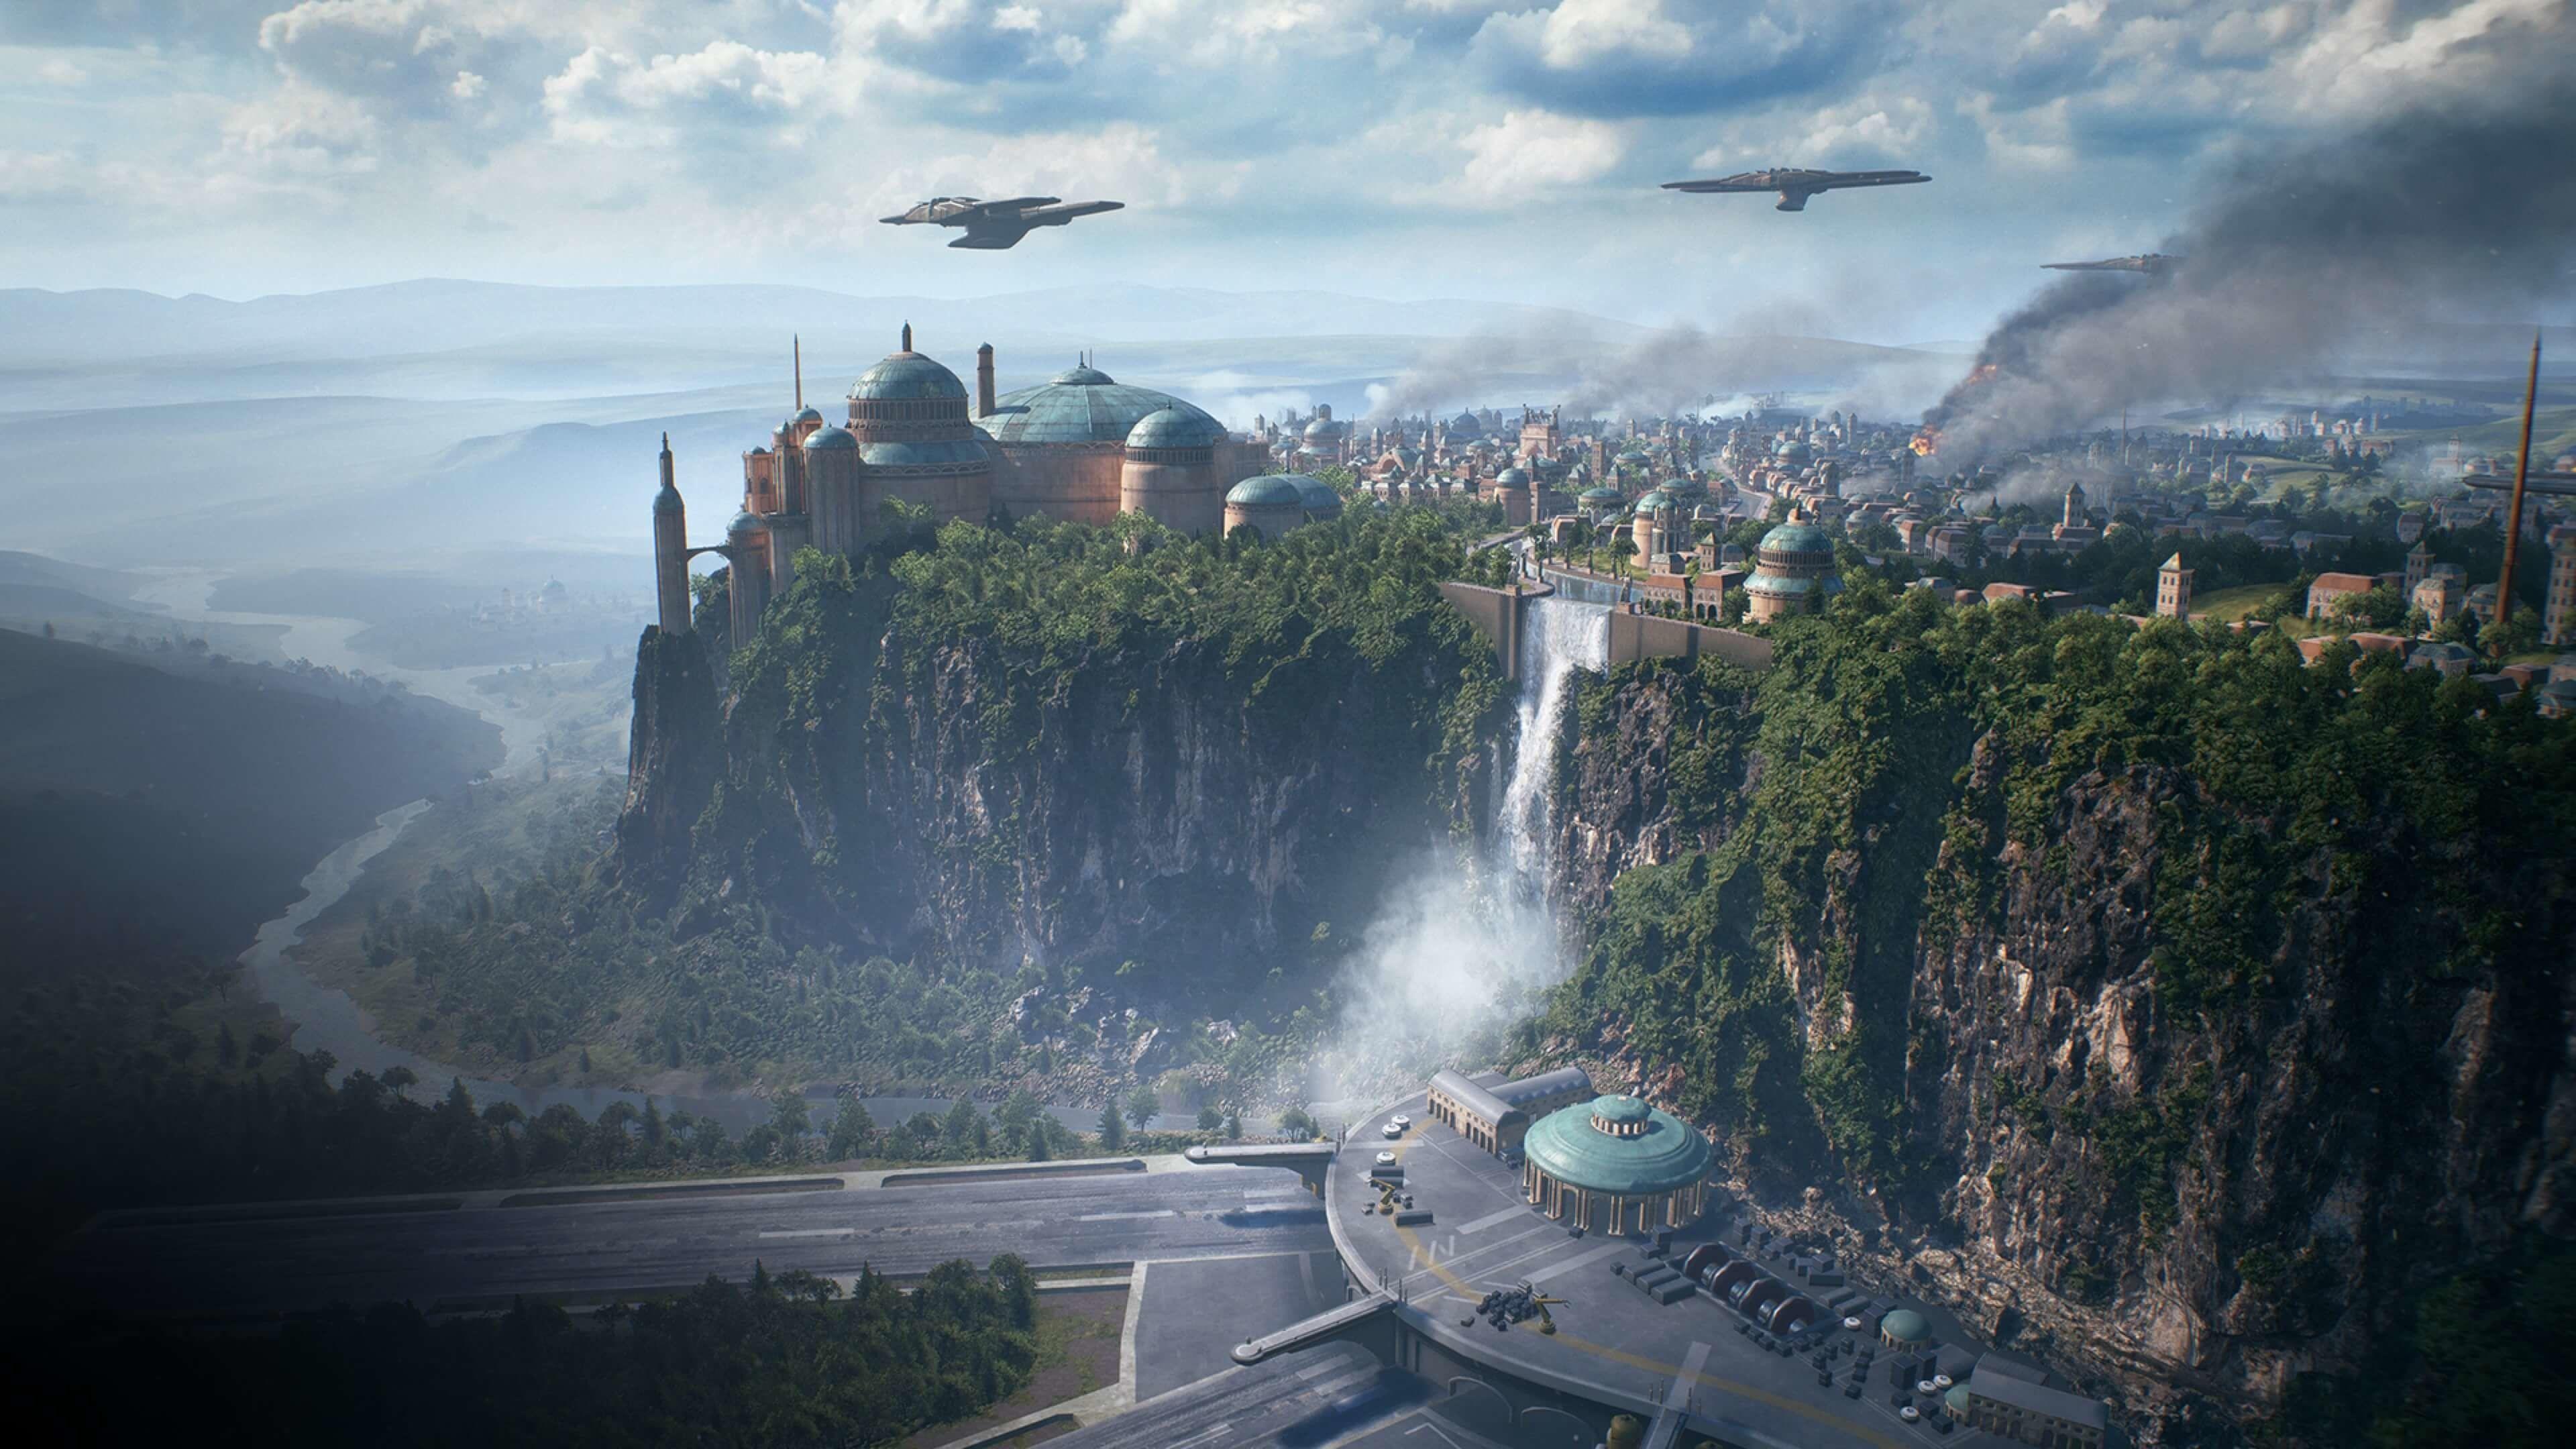 Star Wars Landscape Wallpapers Top Free Star Wars Landscape Backgrounds Wallpaperaccess